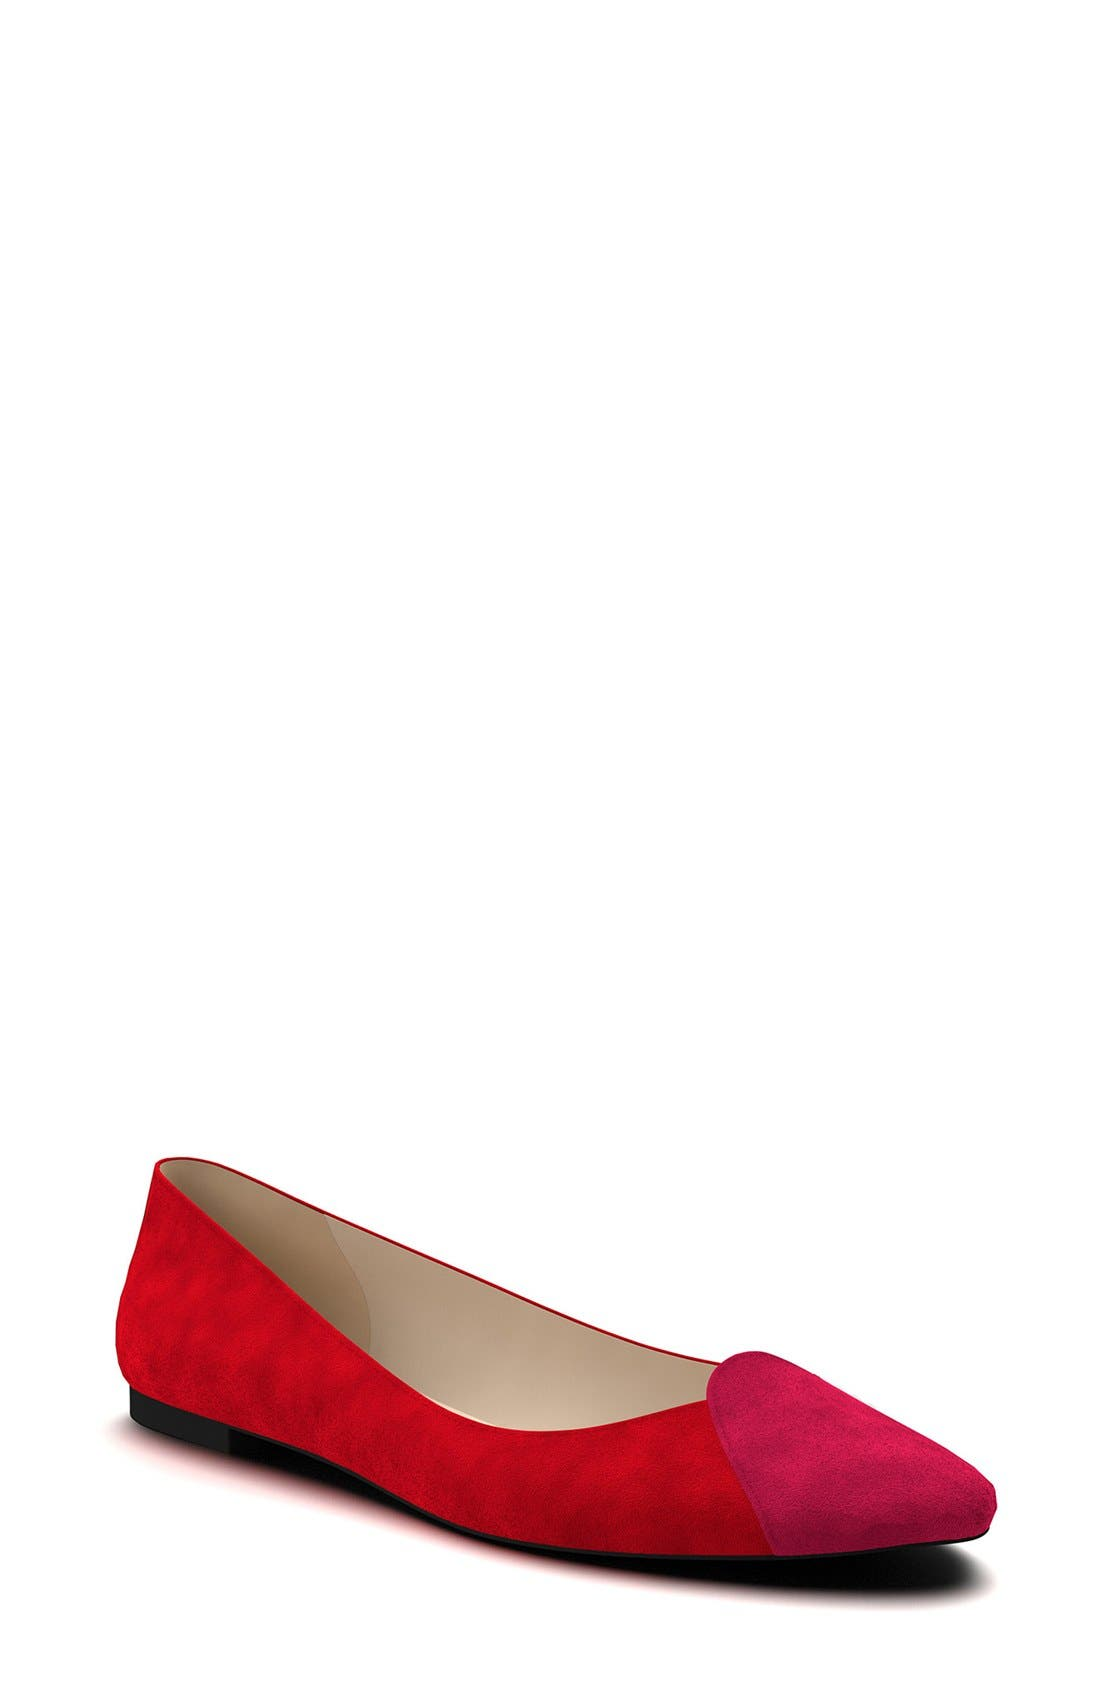 Shoes of Prey Loafer Ballet Flat (Women) (Nordstrom Exclusive)